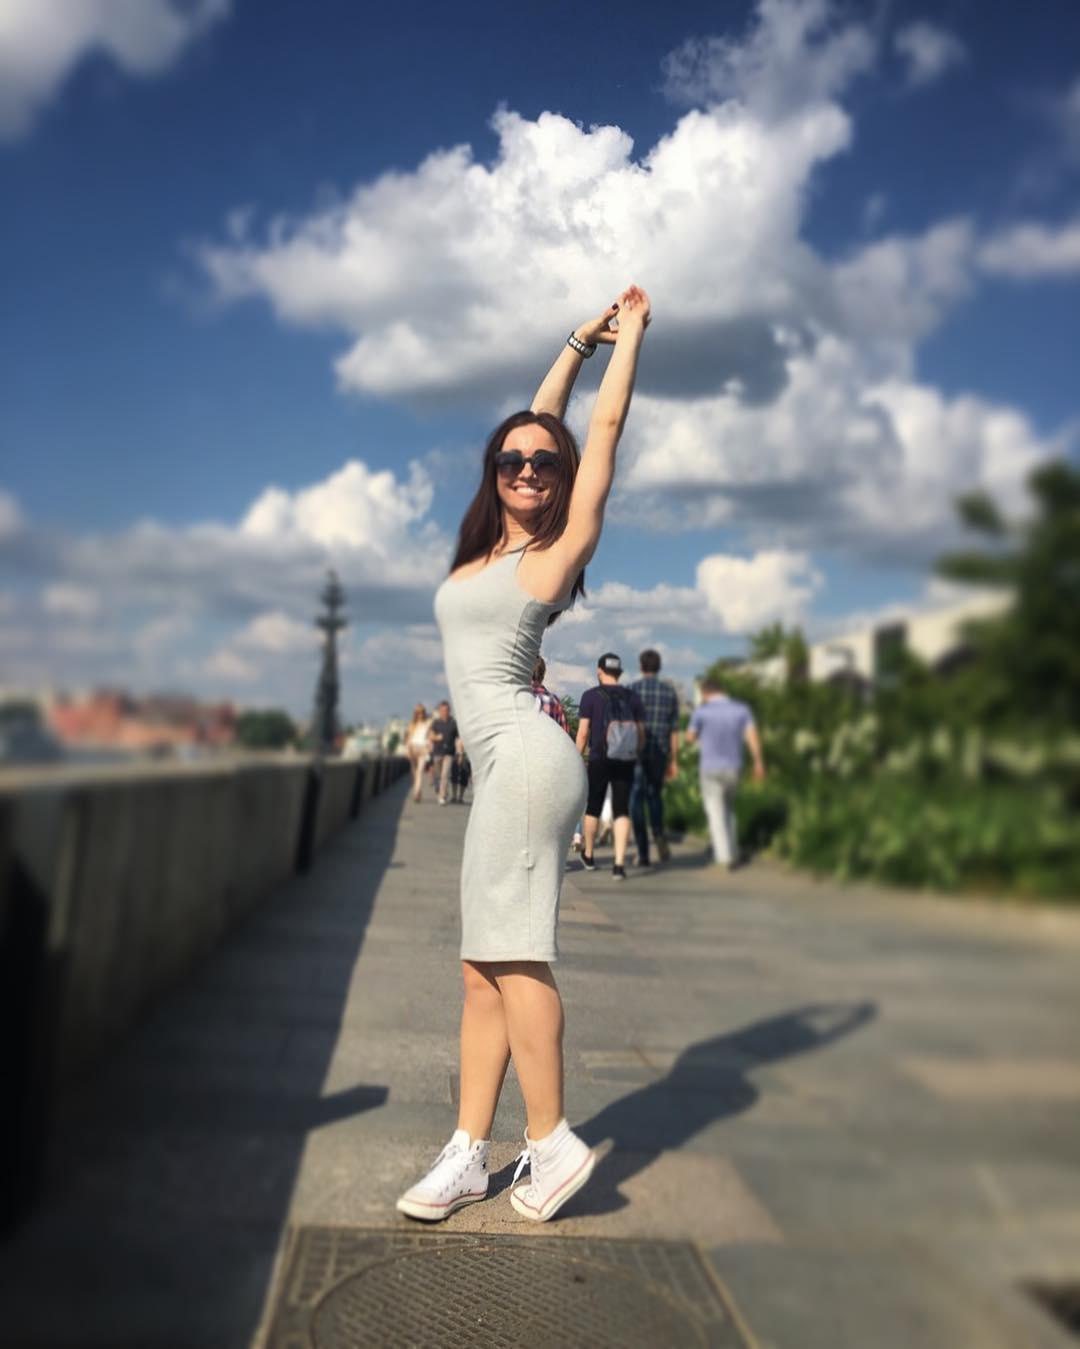 https://img-fotki.yandex.ru/get/103691/123965731.4b/0_116441_5b0fda29_orig.jpg